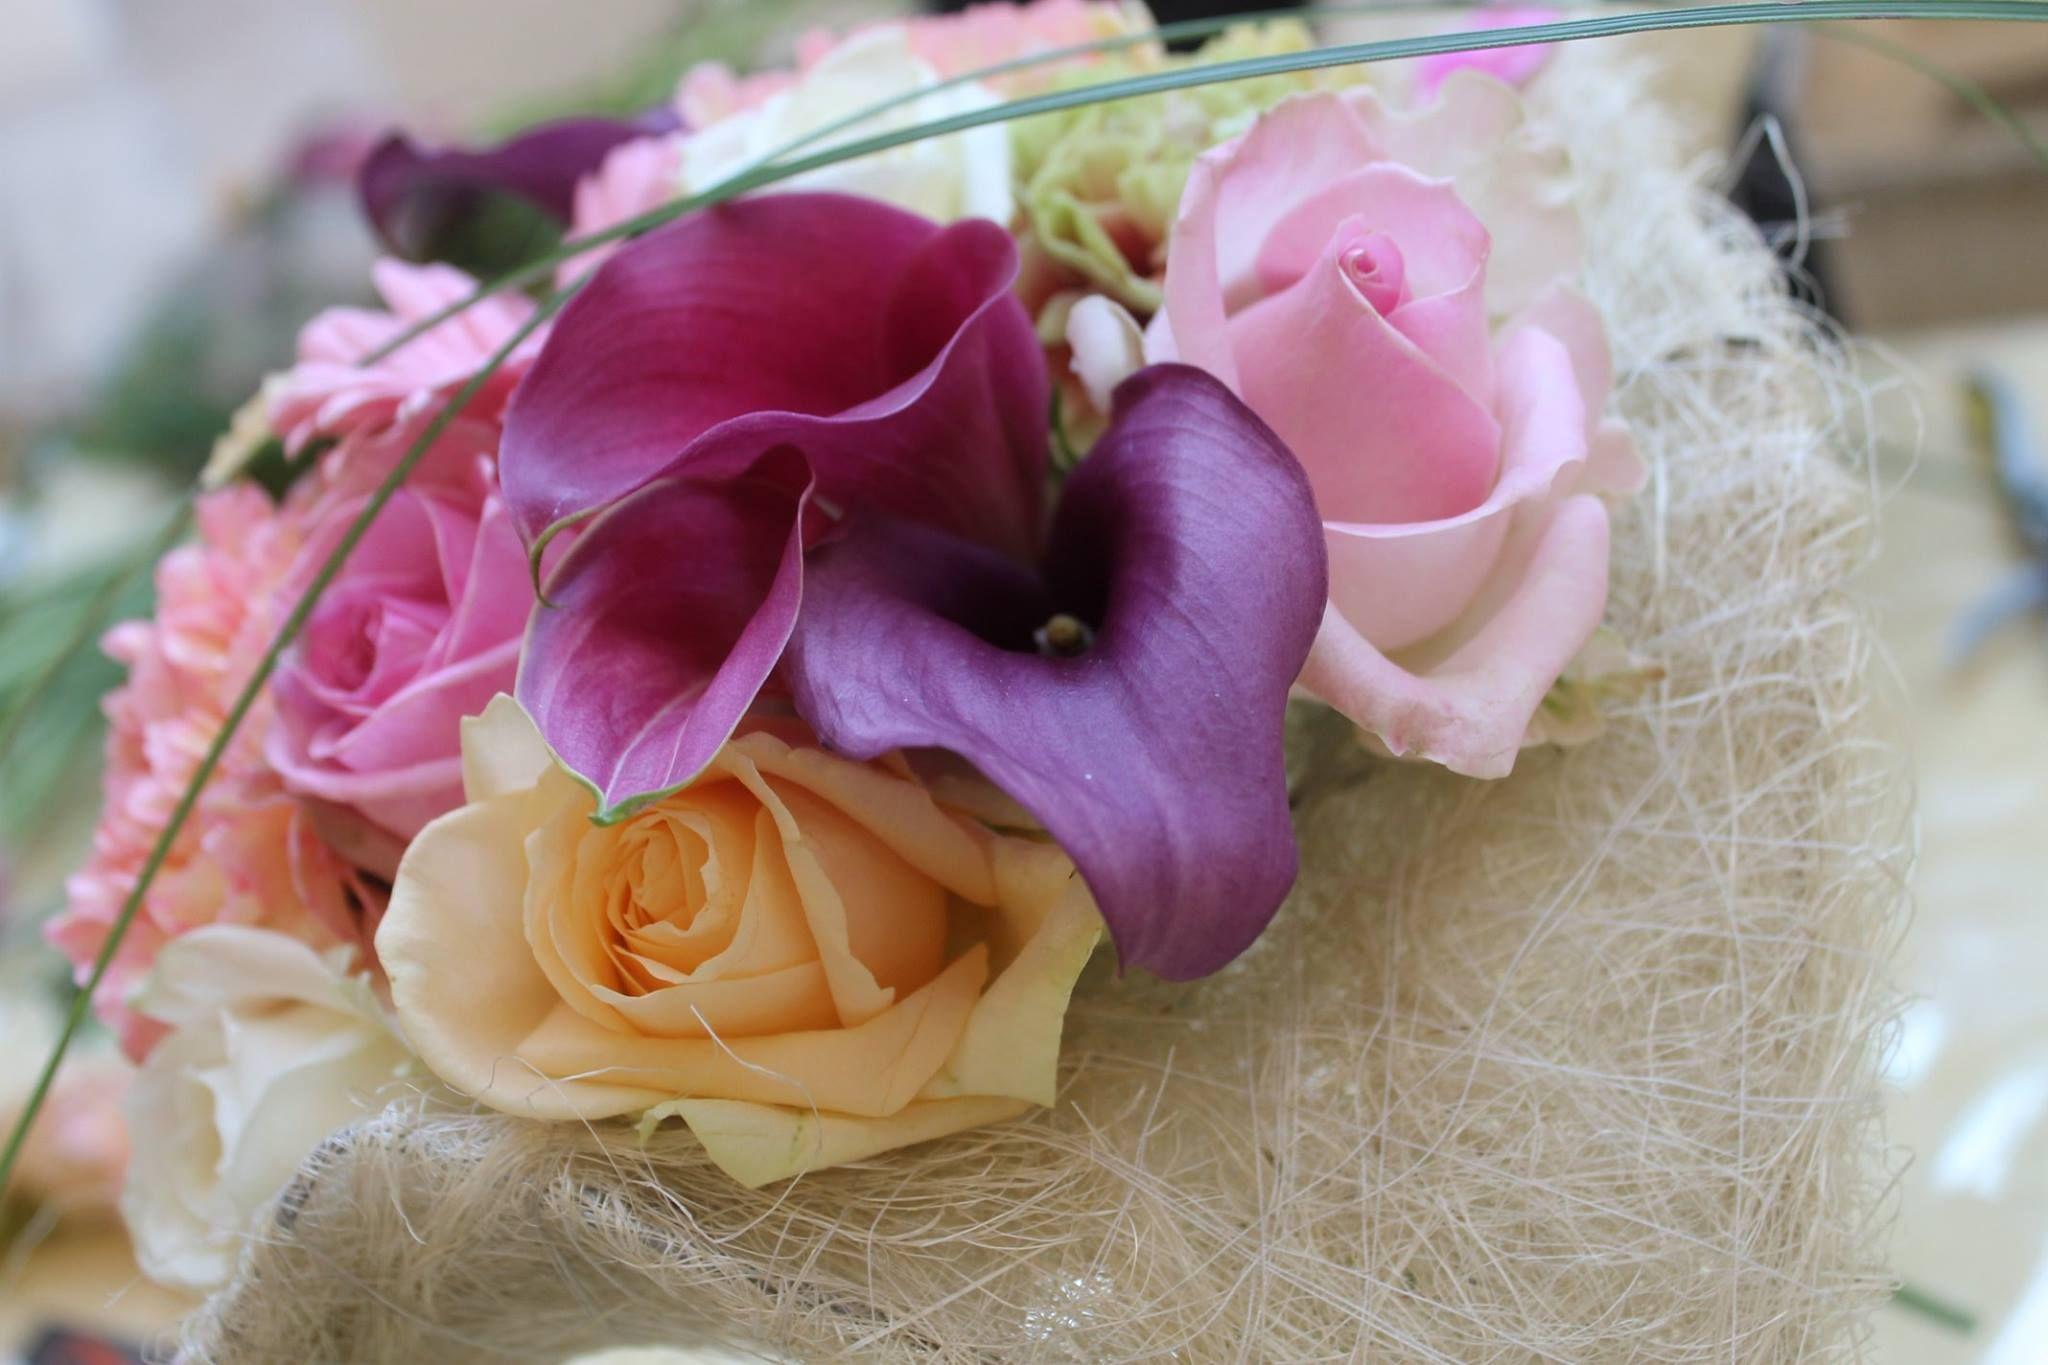 #dettaglidasposare #matrimonio #euroflorasrl #eurofloracarate #bouquet #milanotisposo #fiorirecisi #wedding #domoadami